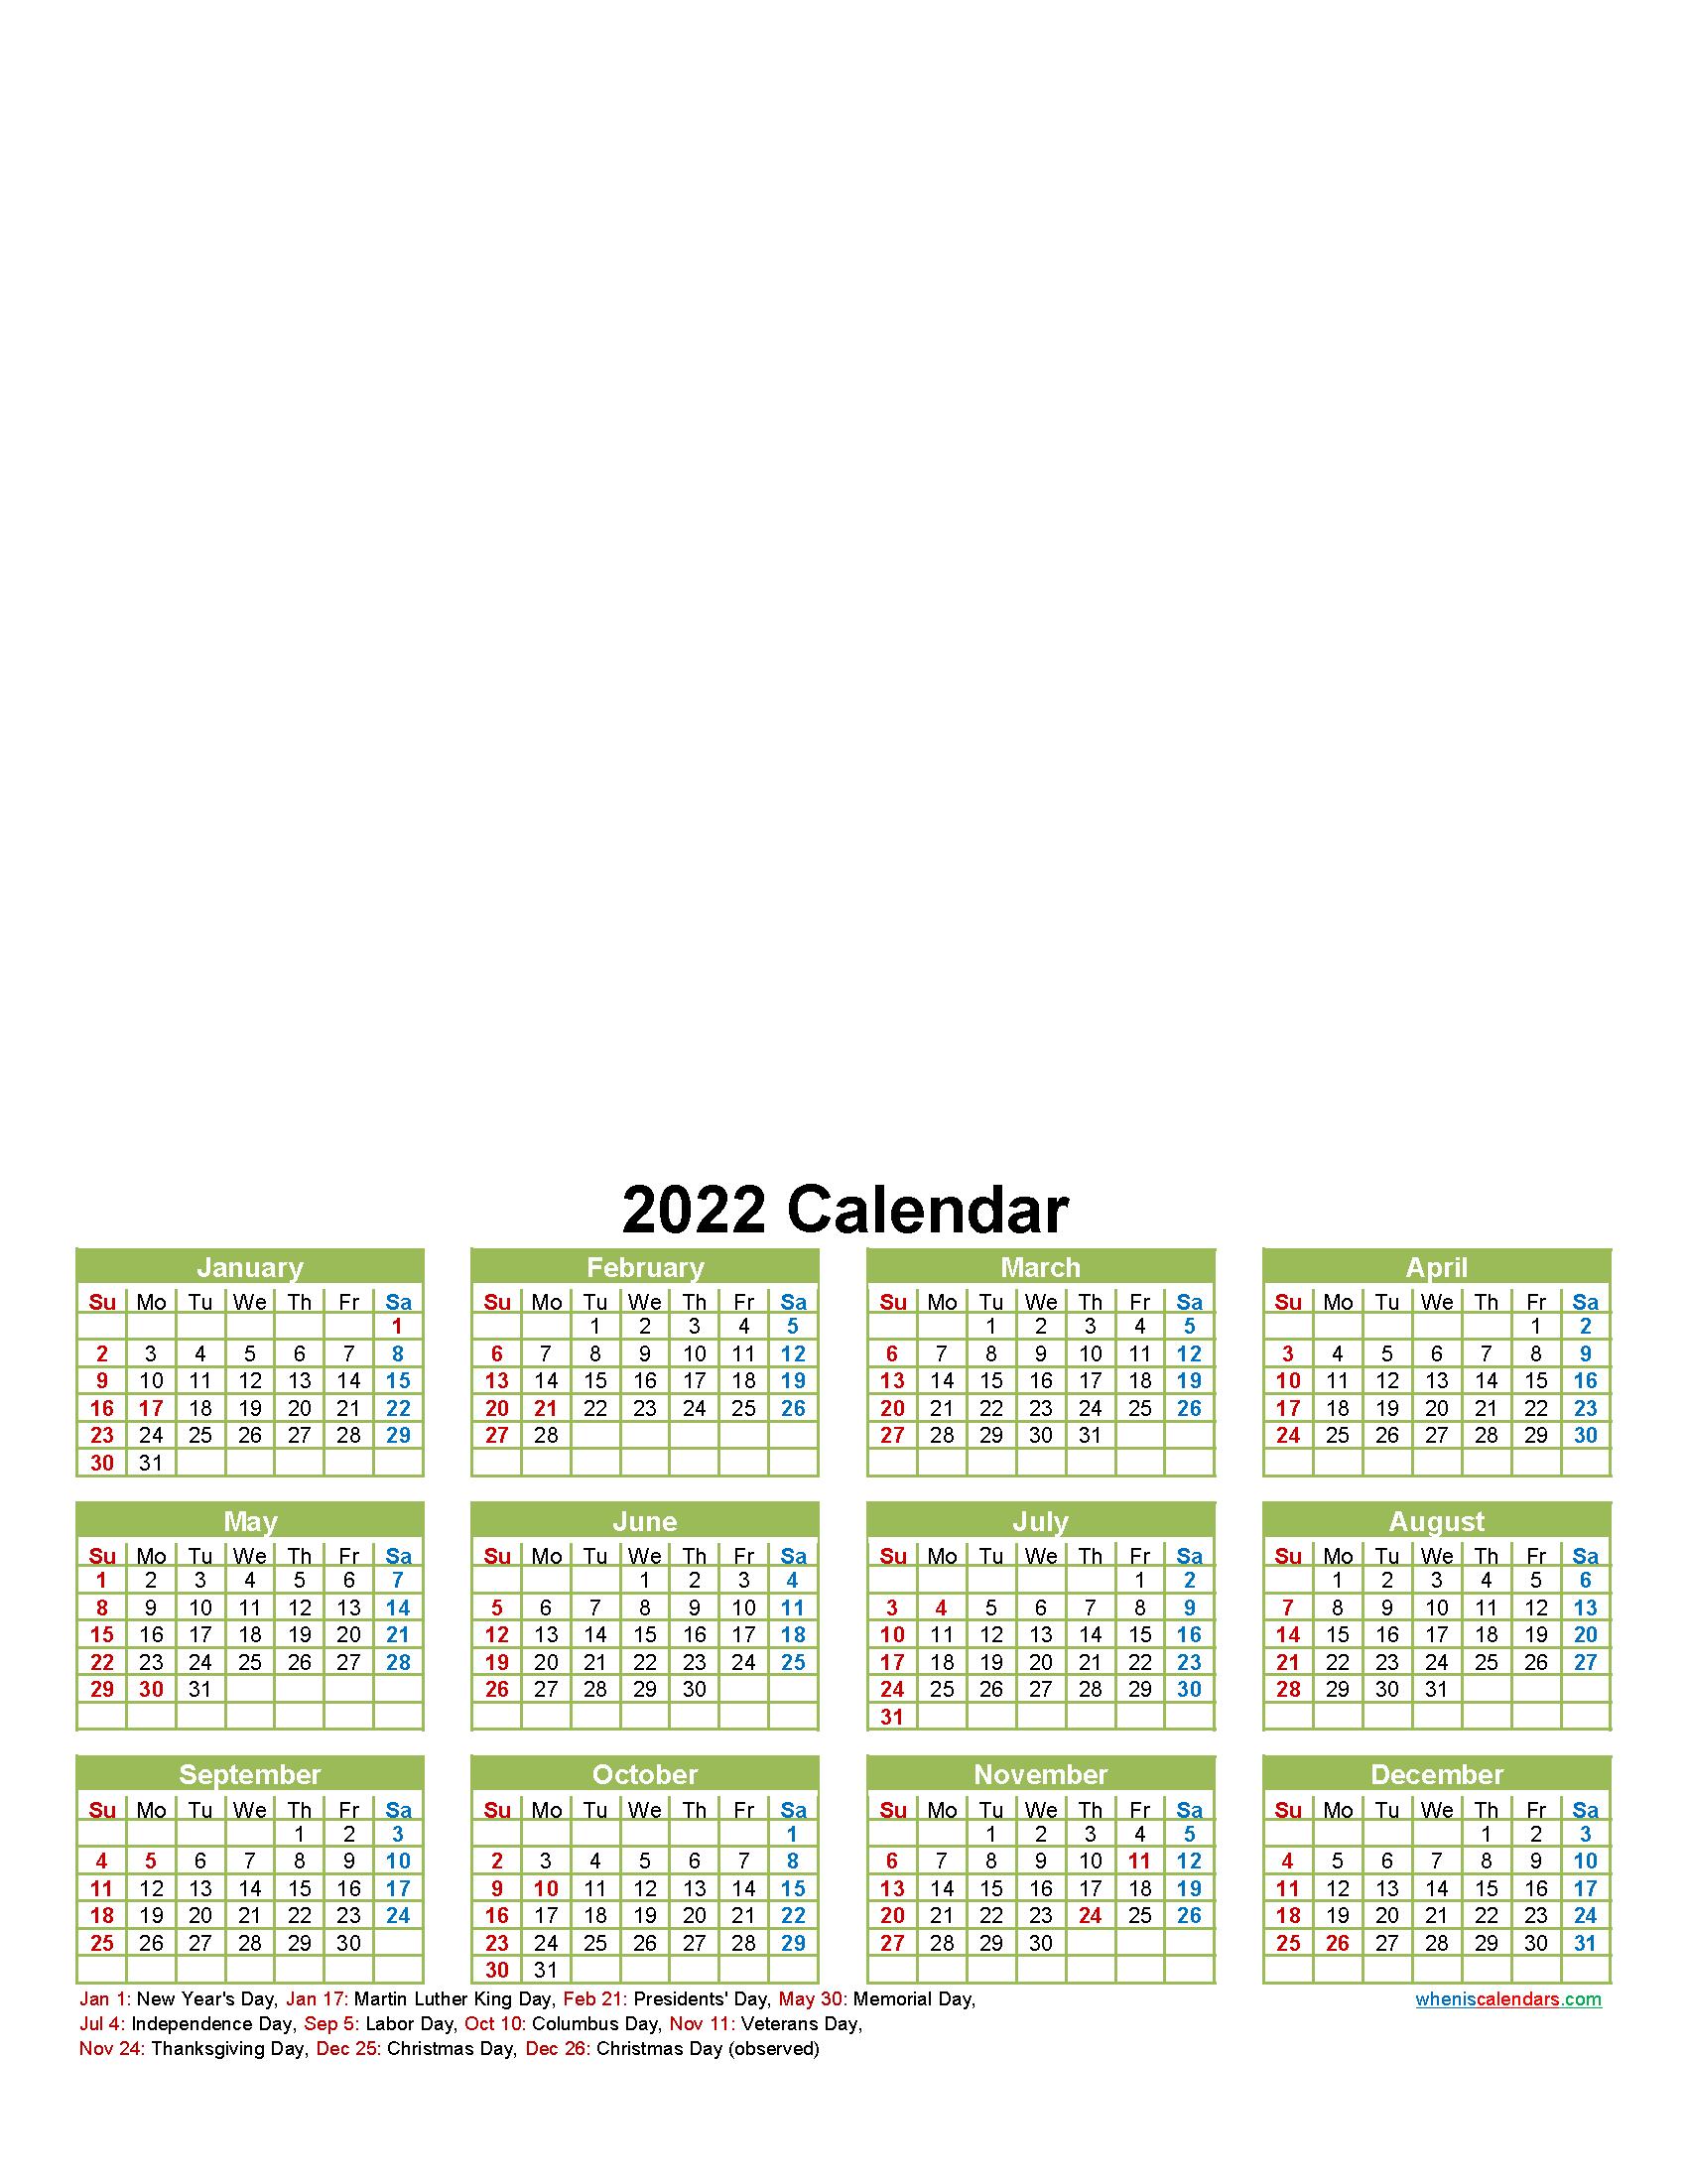 Personalised Photo Calendar 2022